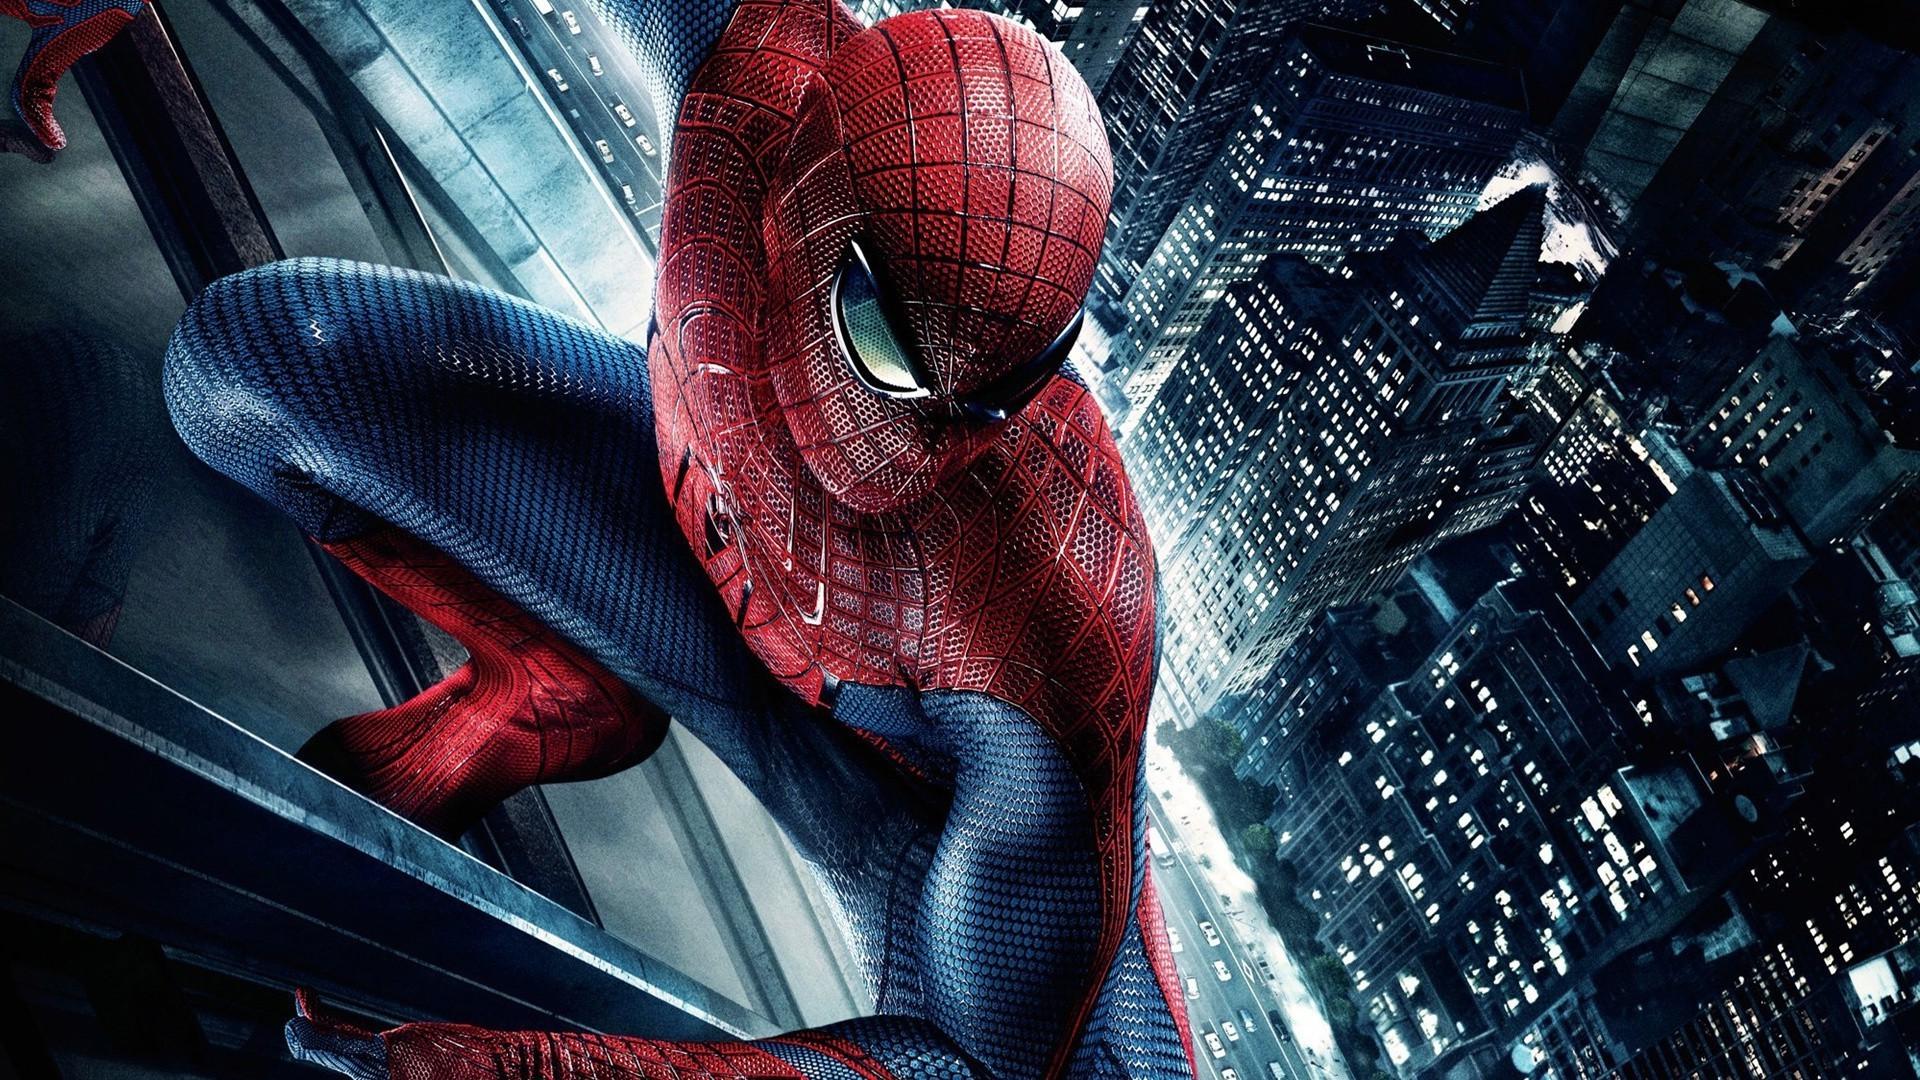 Wallpaper Movies Superhero Spider Man The Amazing Spider Man